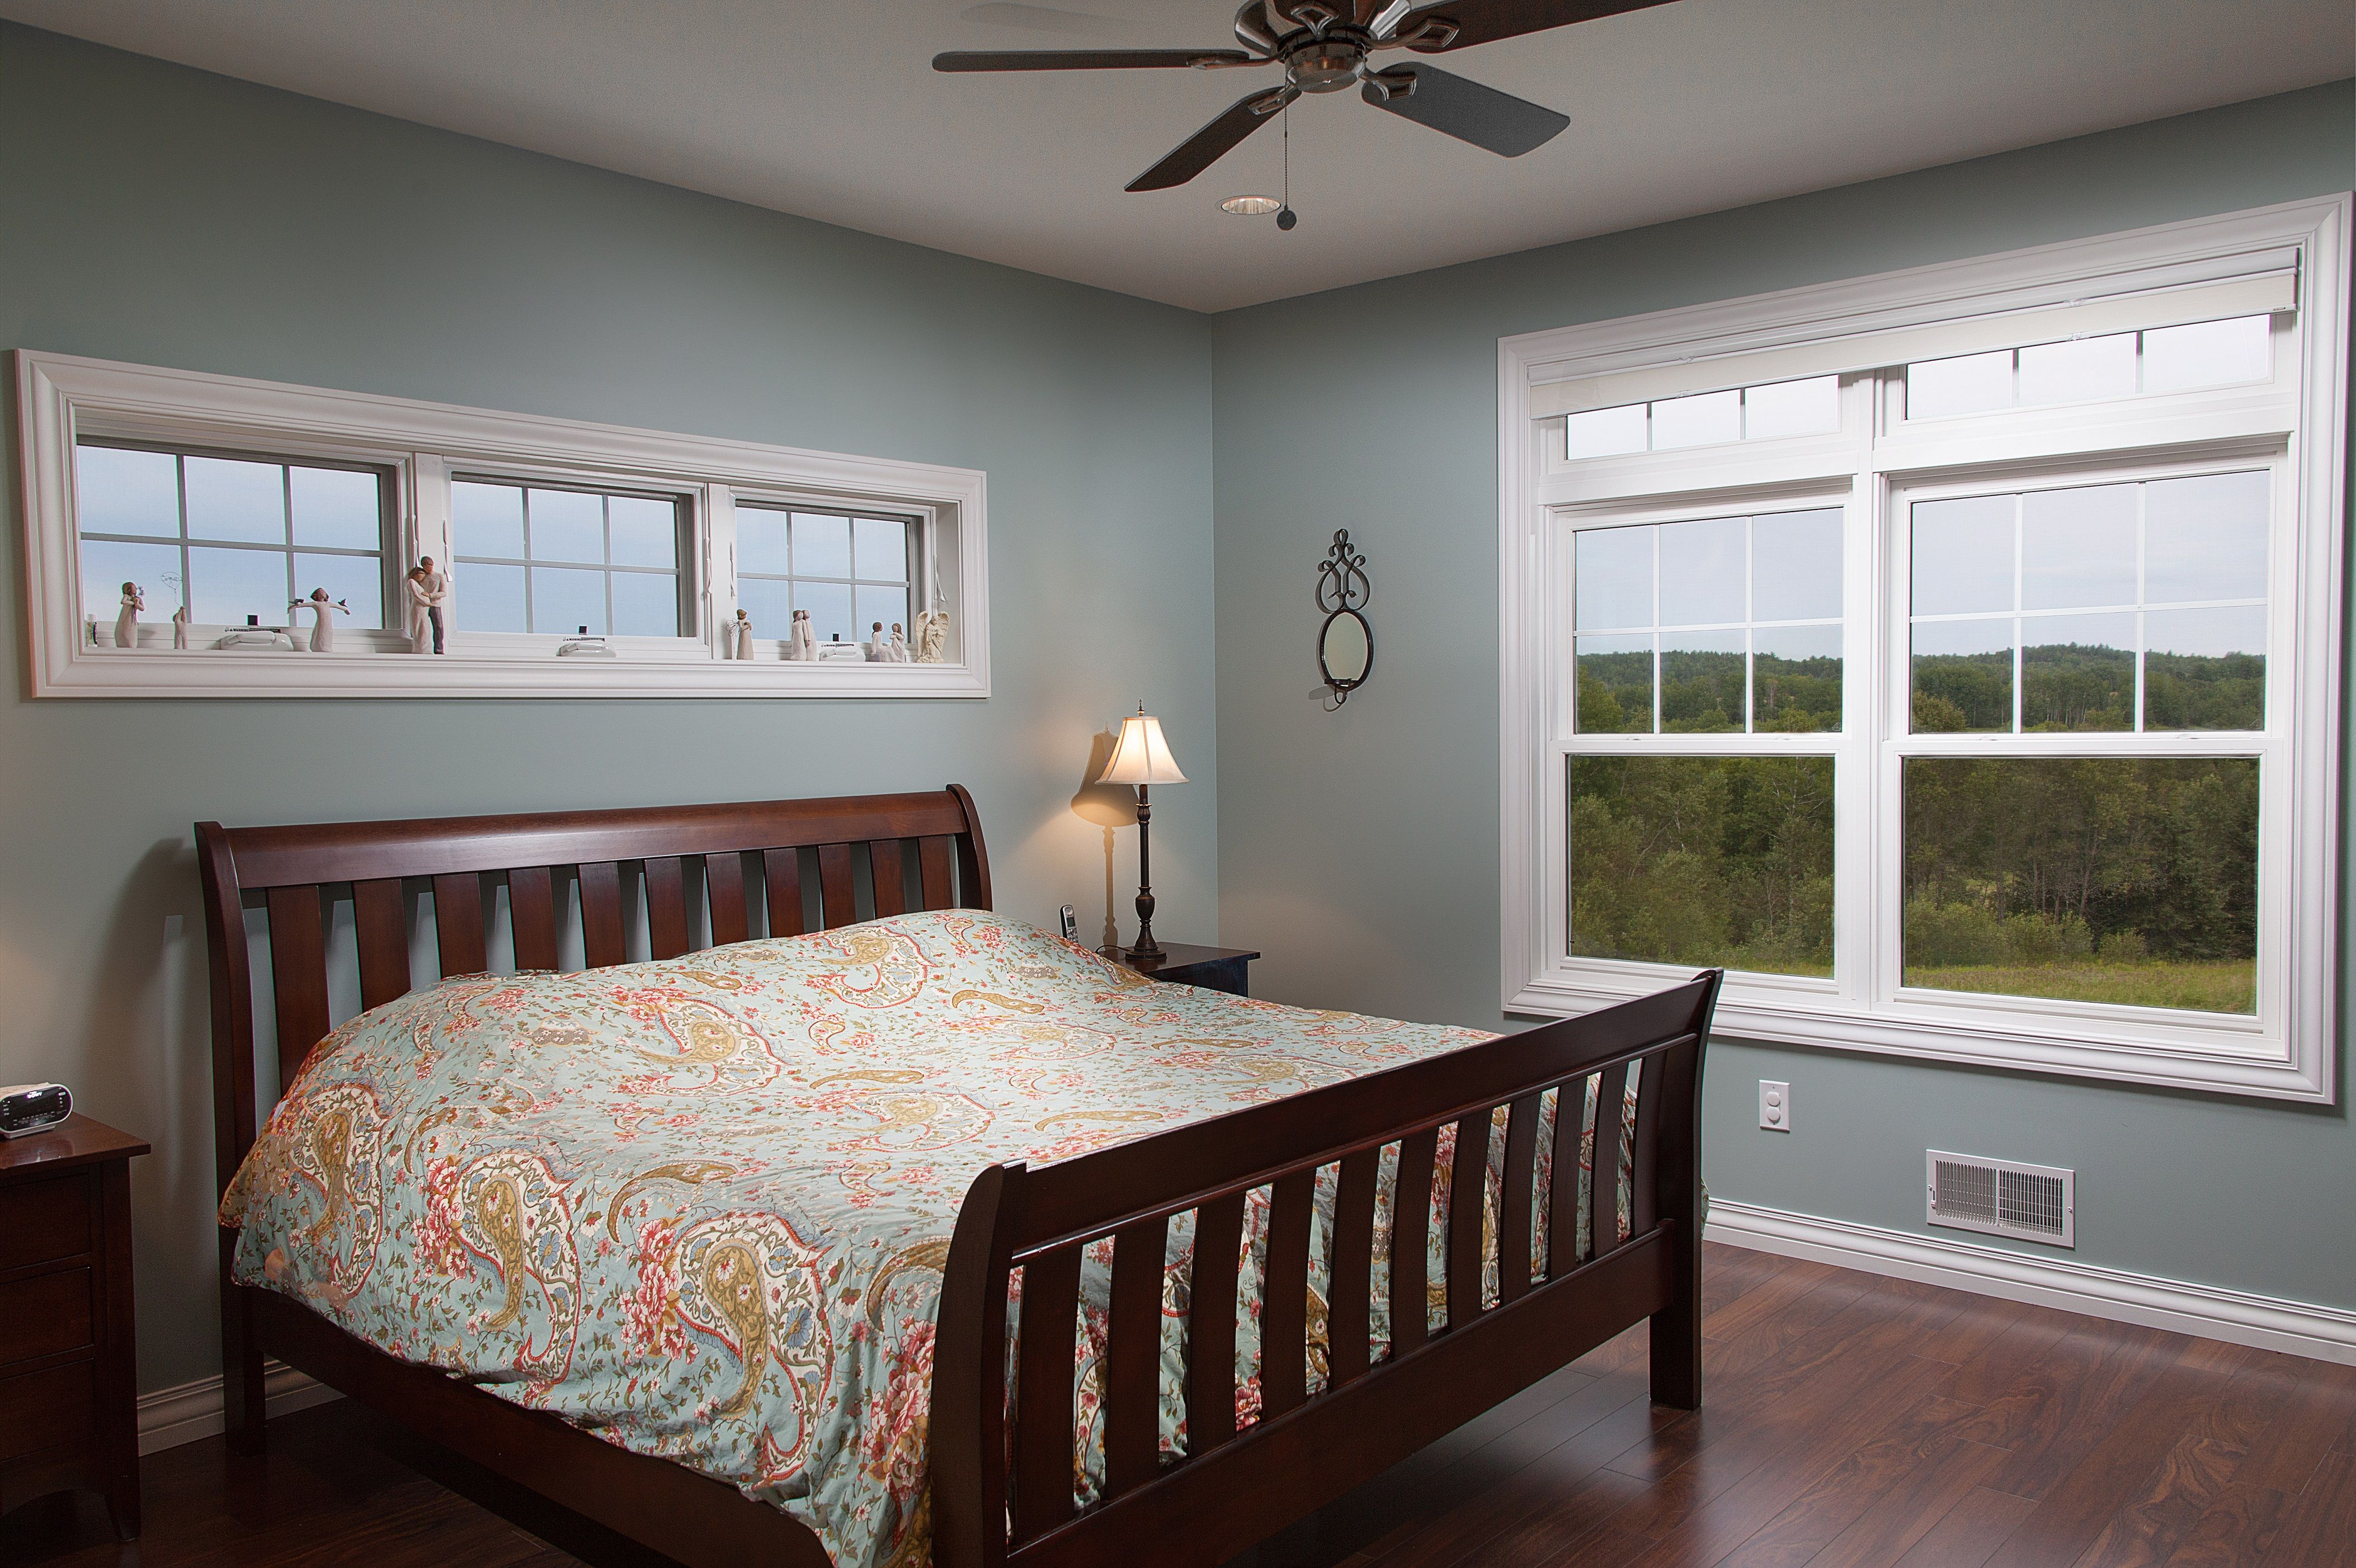 awning windows bedroom